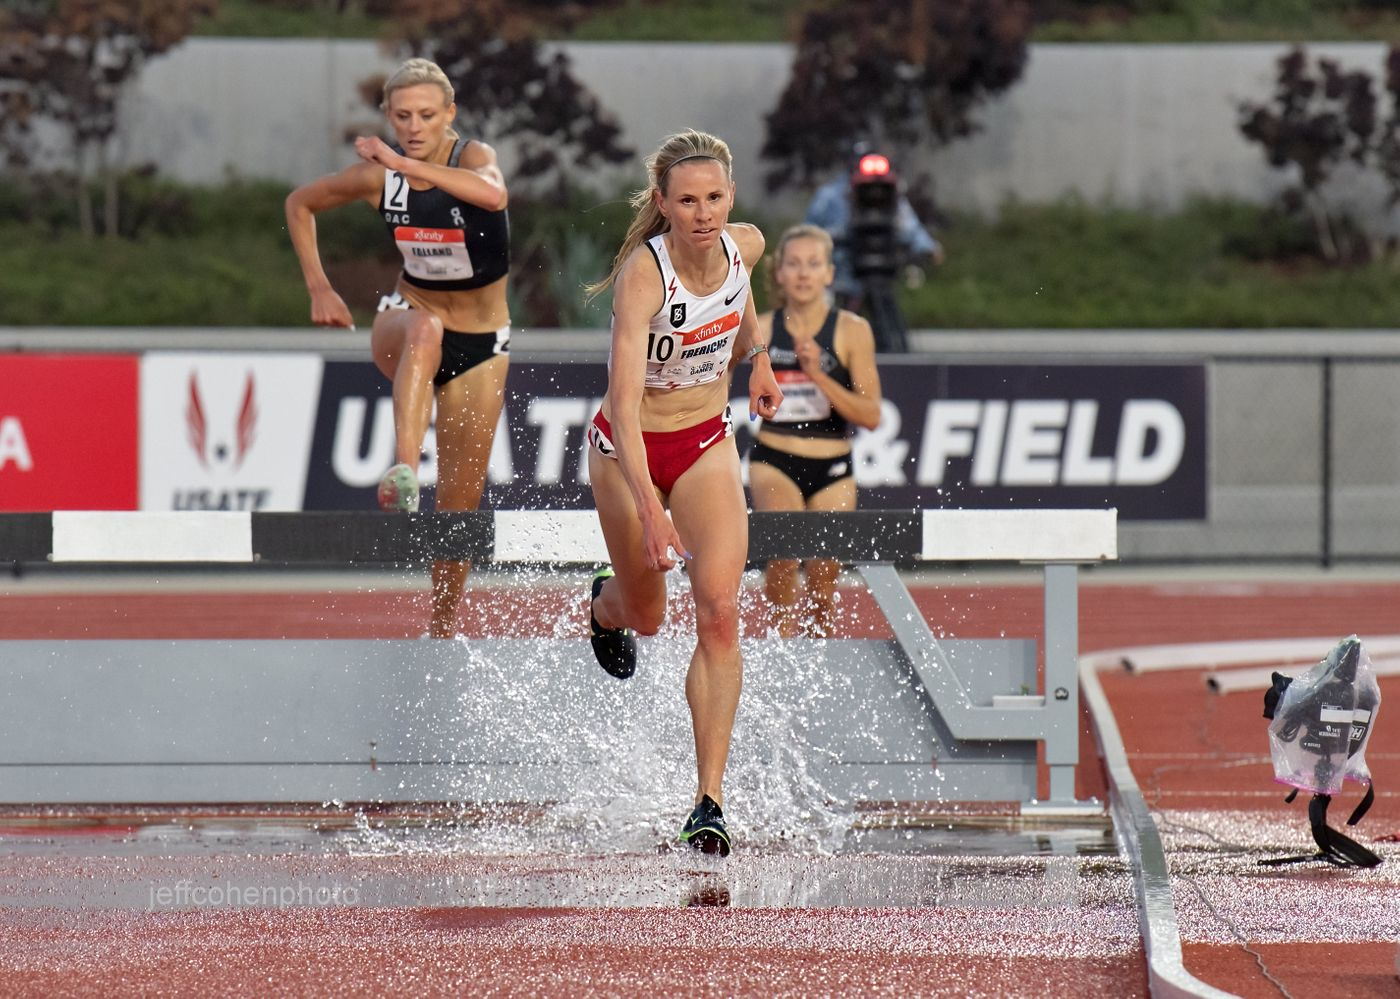 Courtney Frerichs, steeplechase, 2021 Usatf golden games.